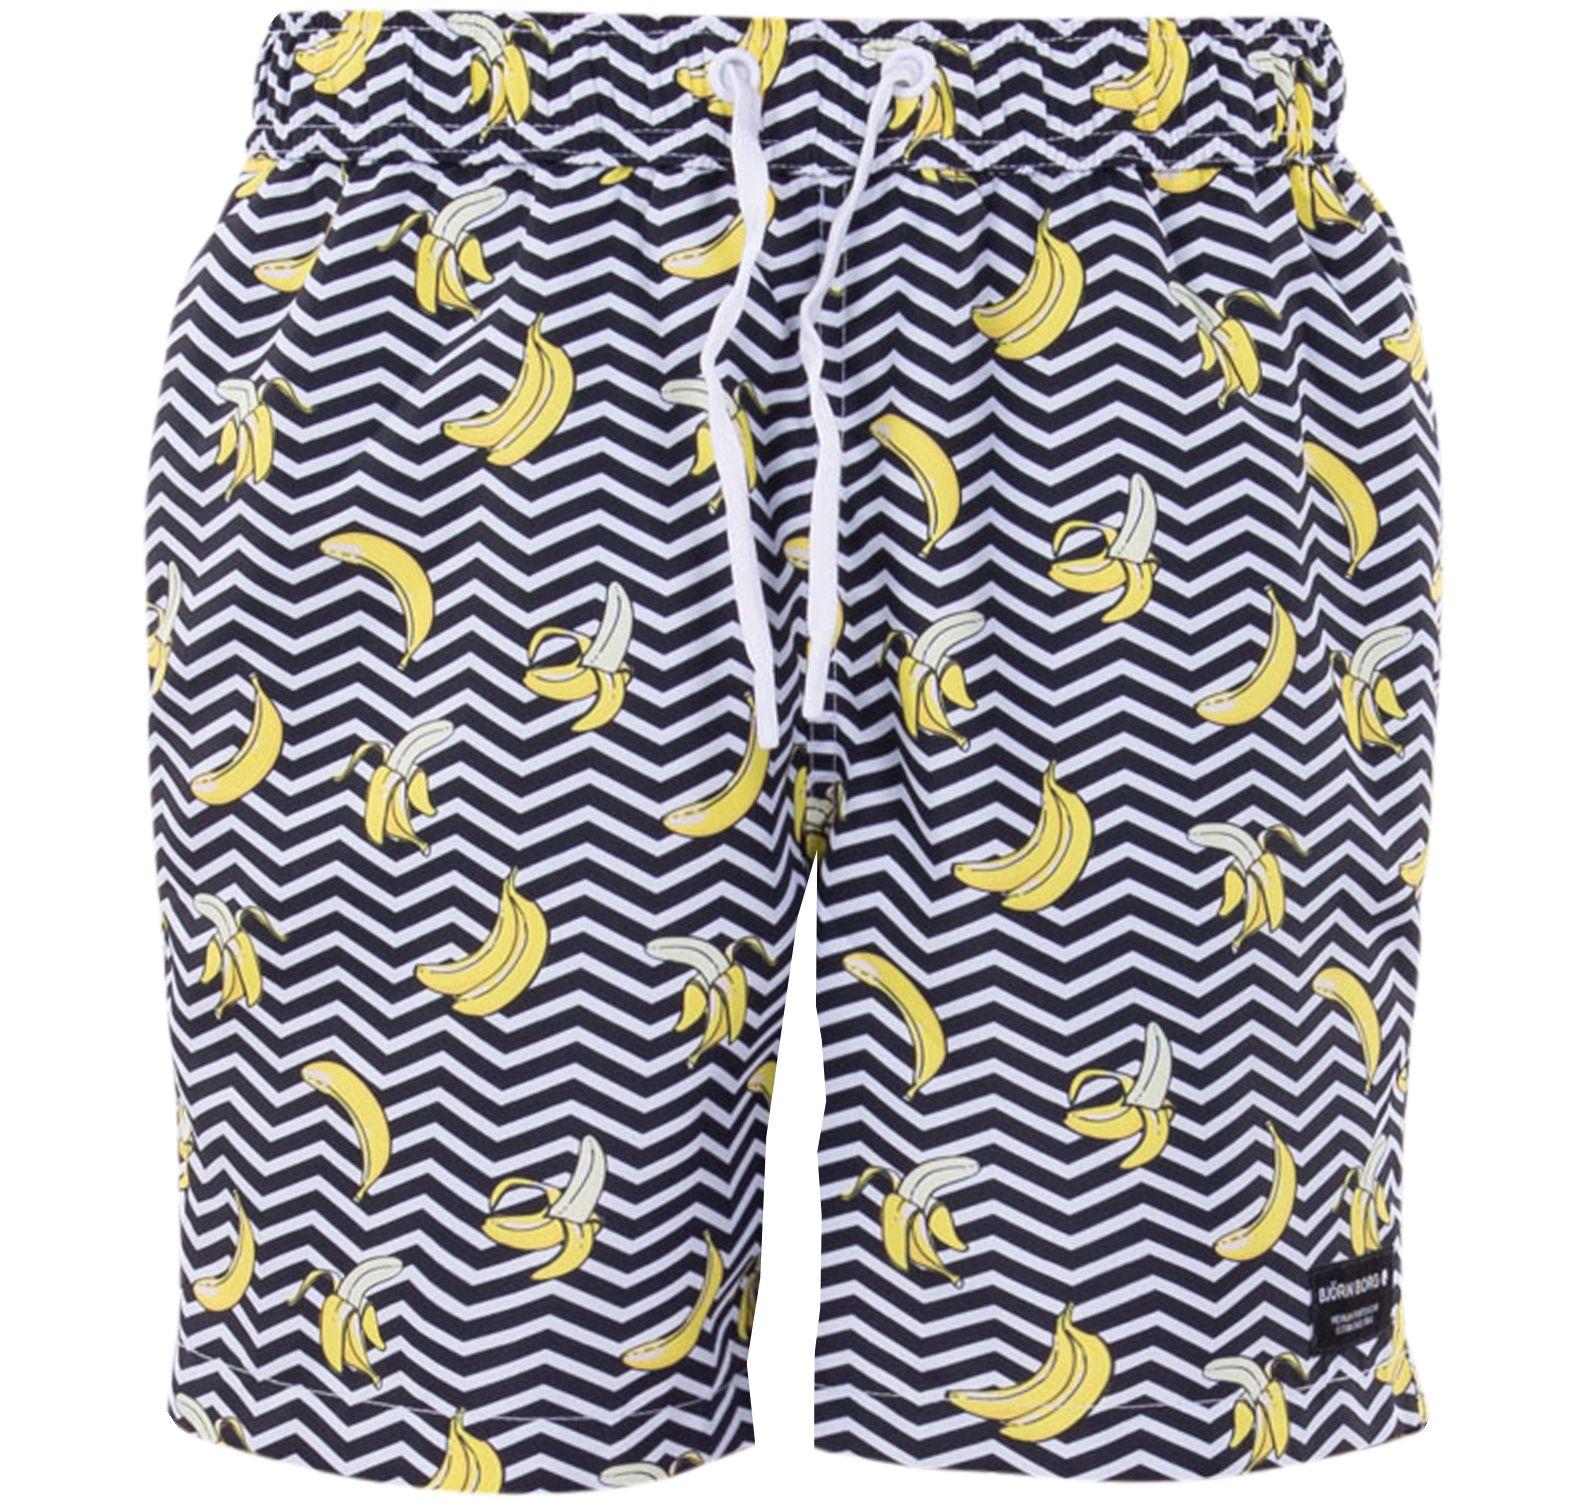 loose shorts kenny kenny, bb banana stripe black beauty, 134-140, björn borg